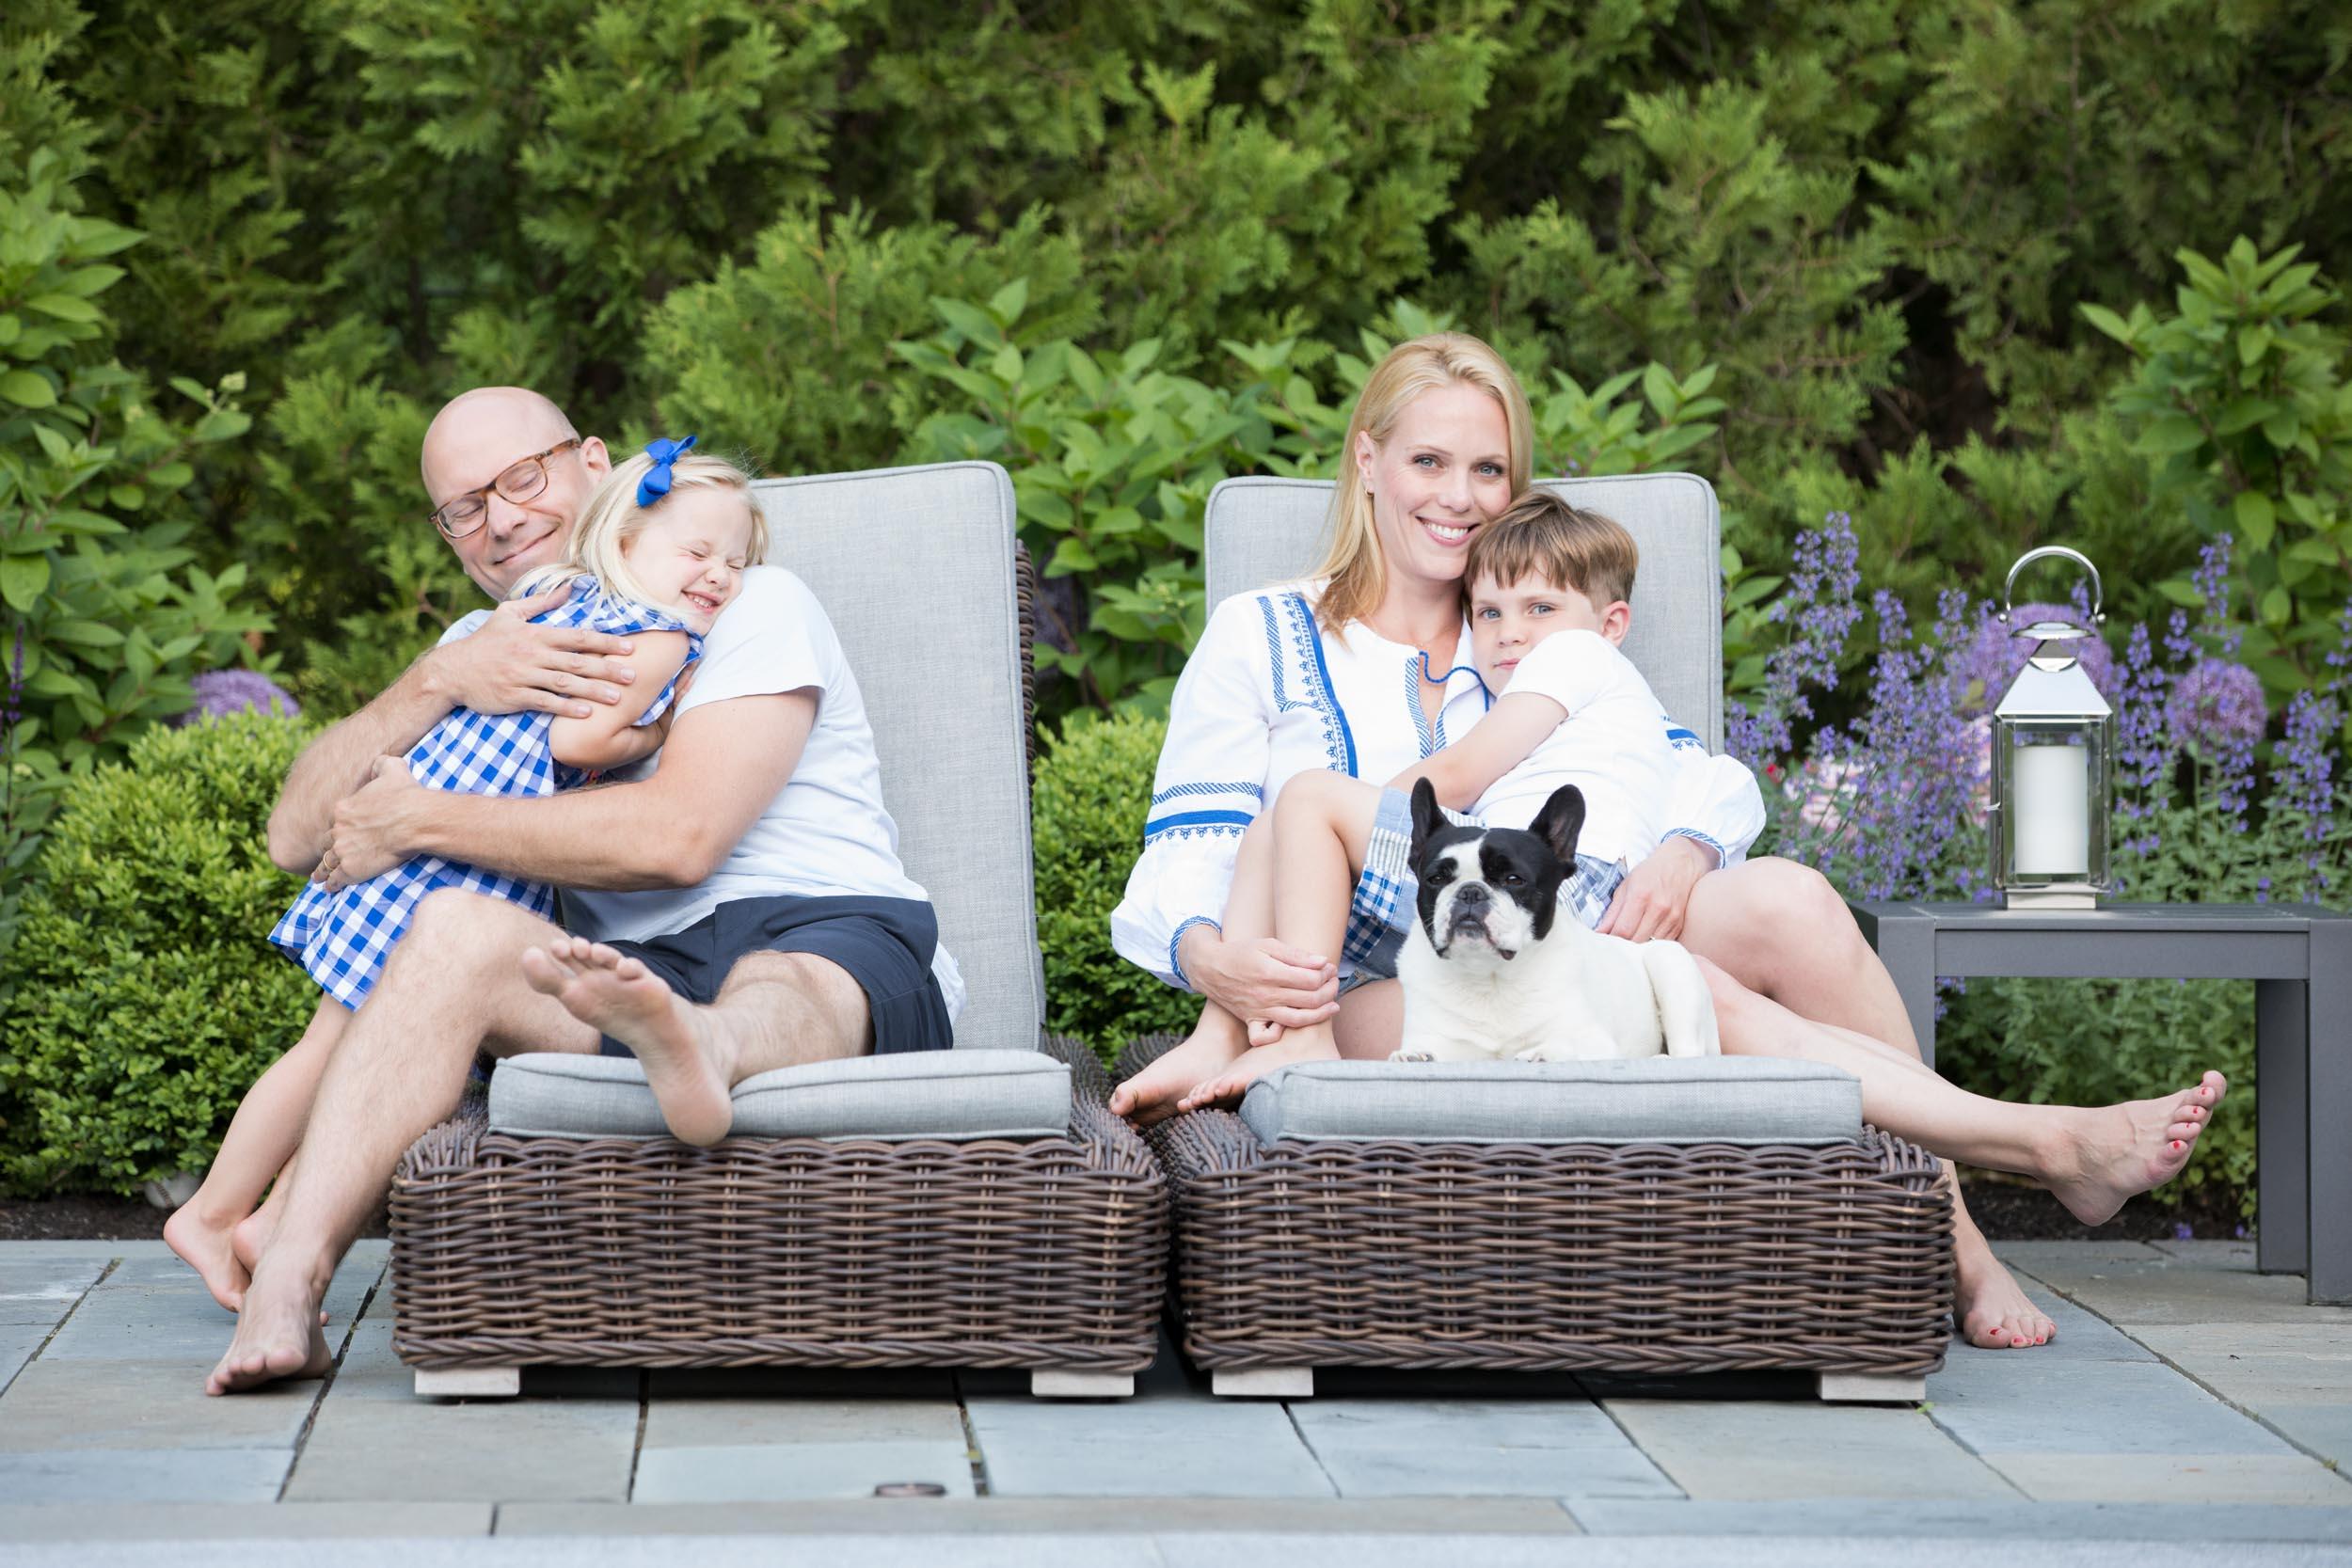 family-love-hugs-candid-poolside-summer.jpg